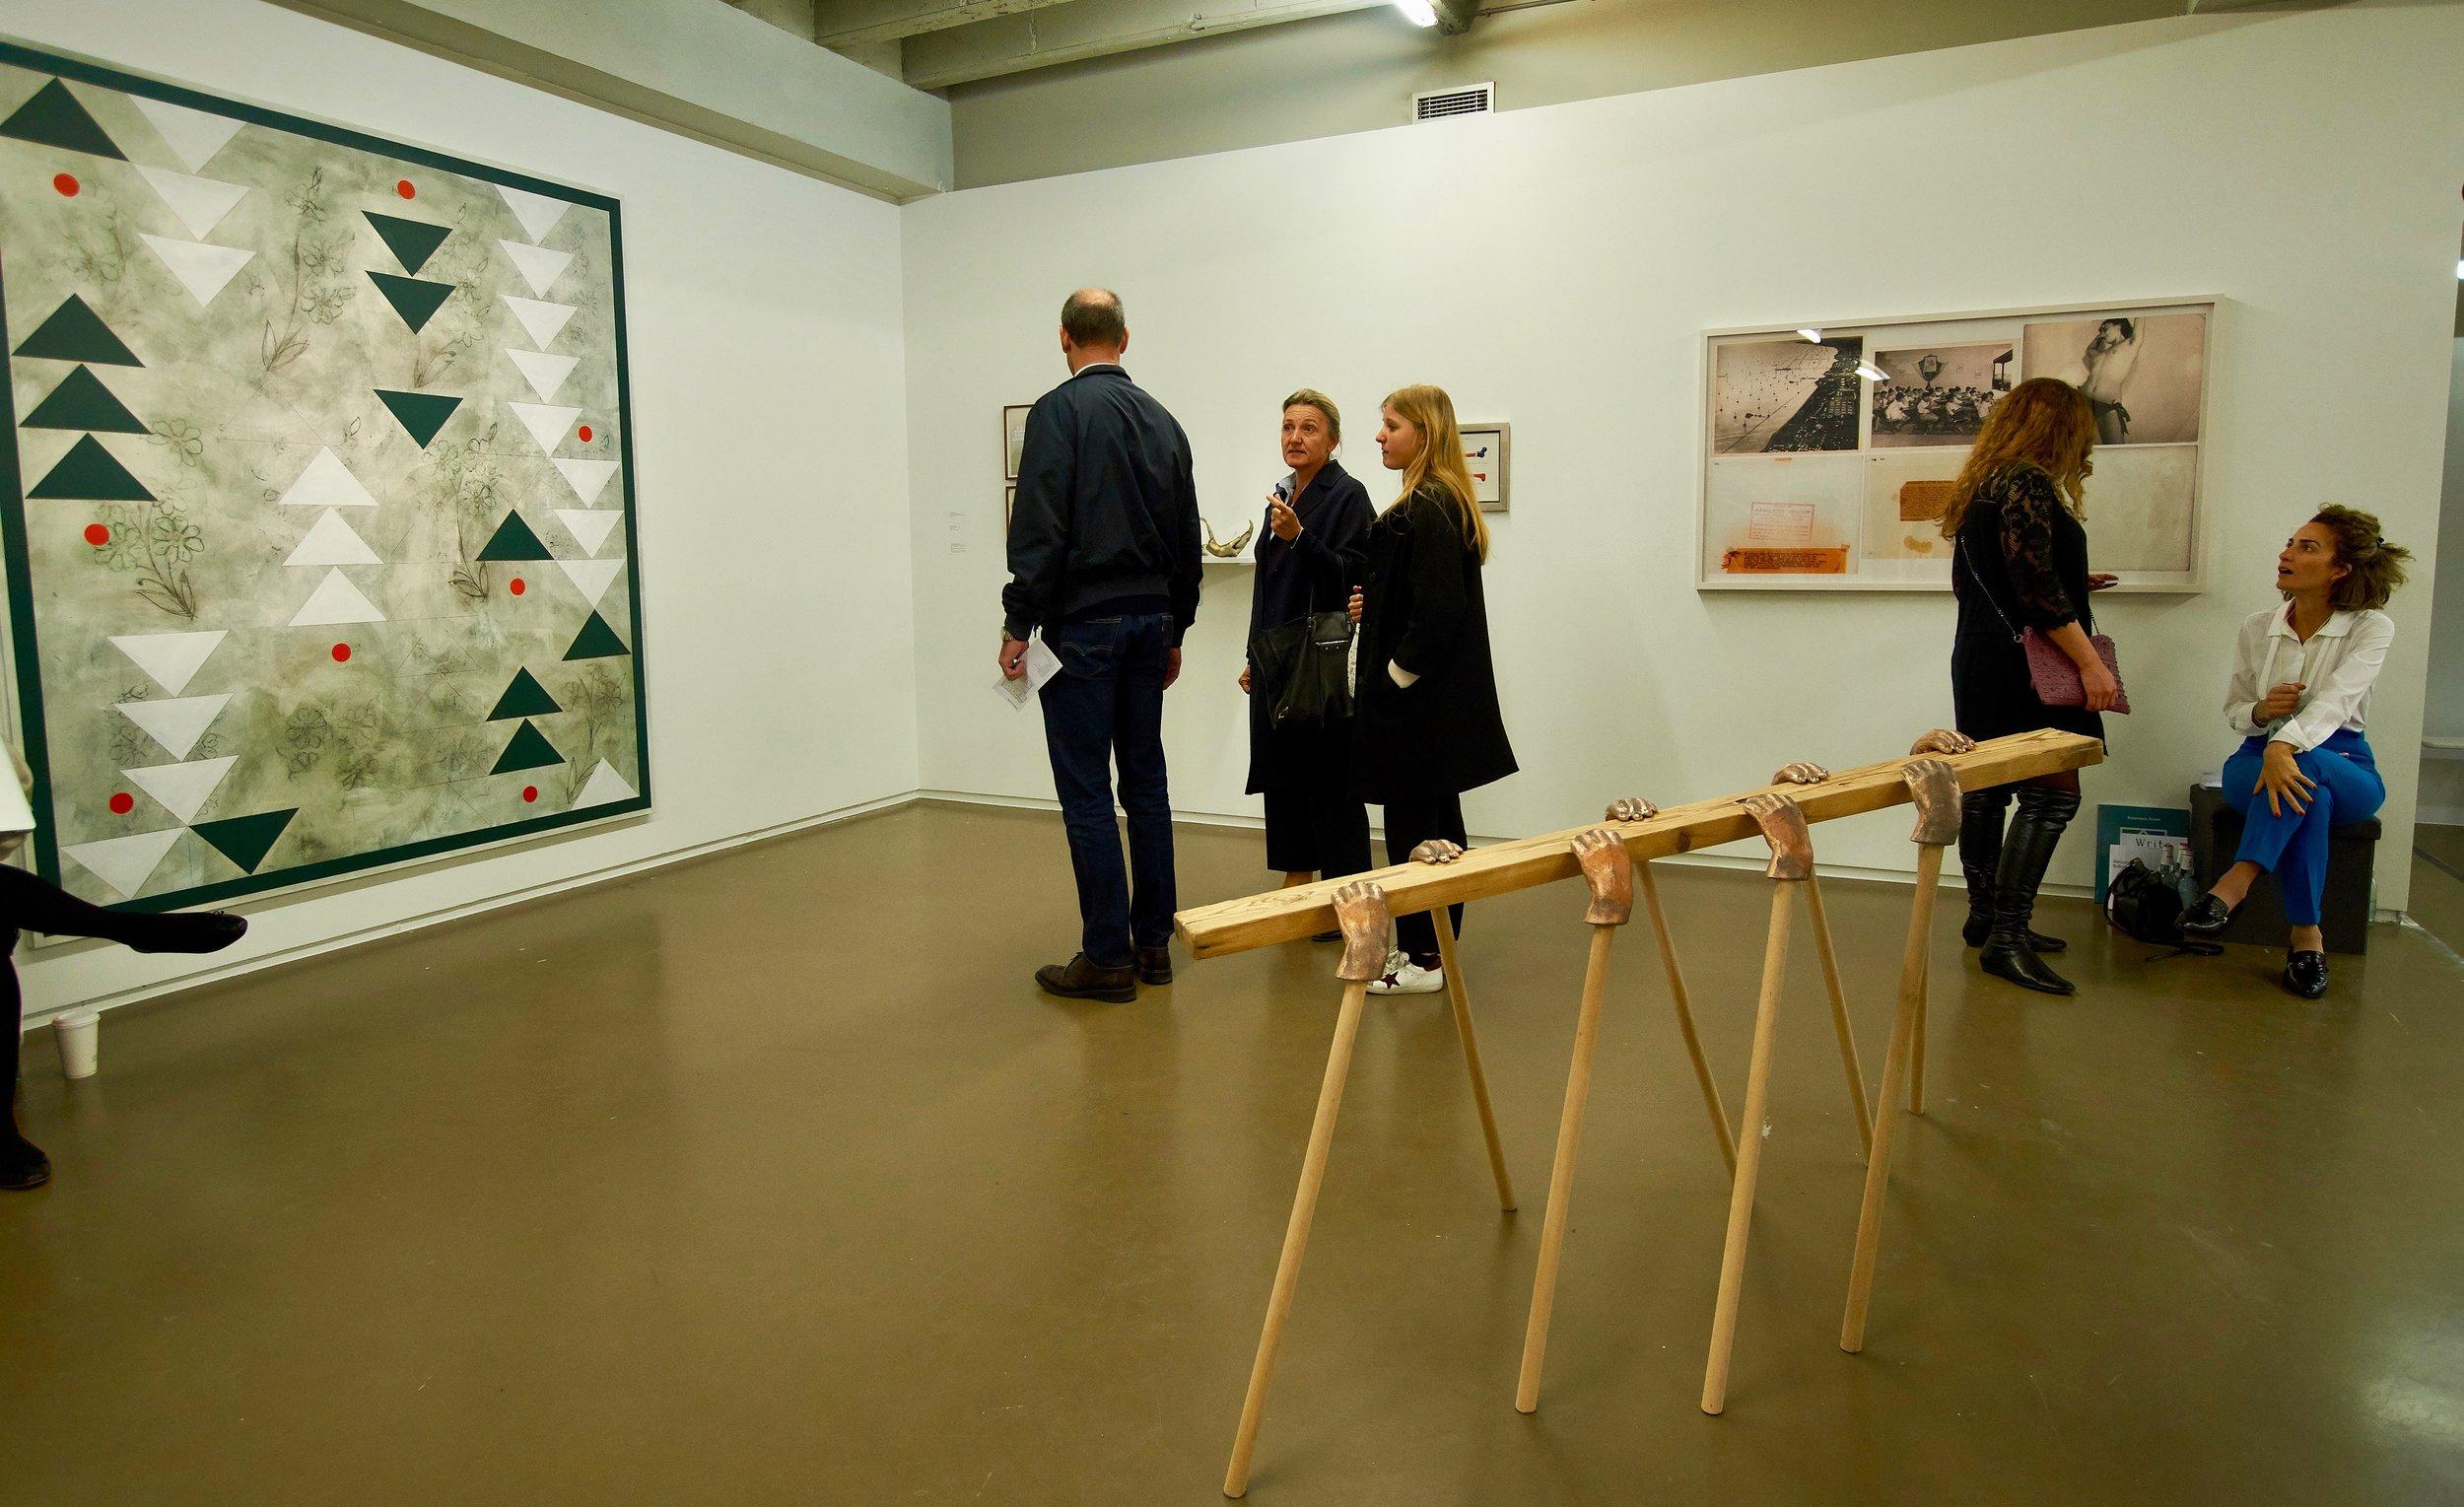 Hera Büyüktasçiyan at Green Art Gallery